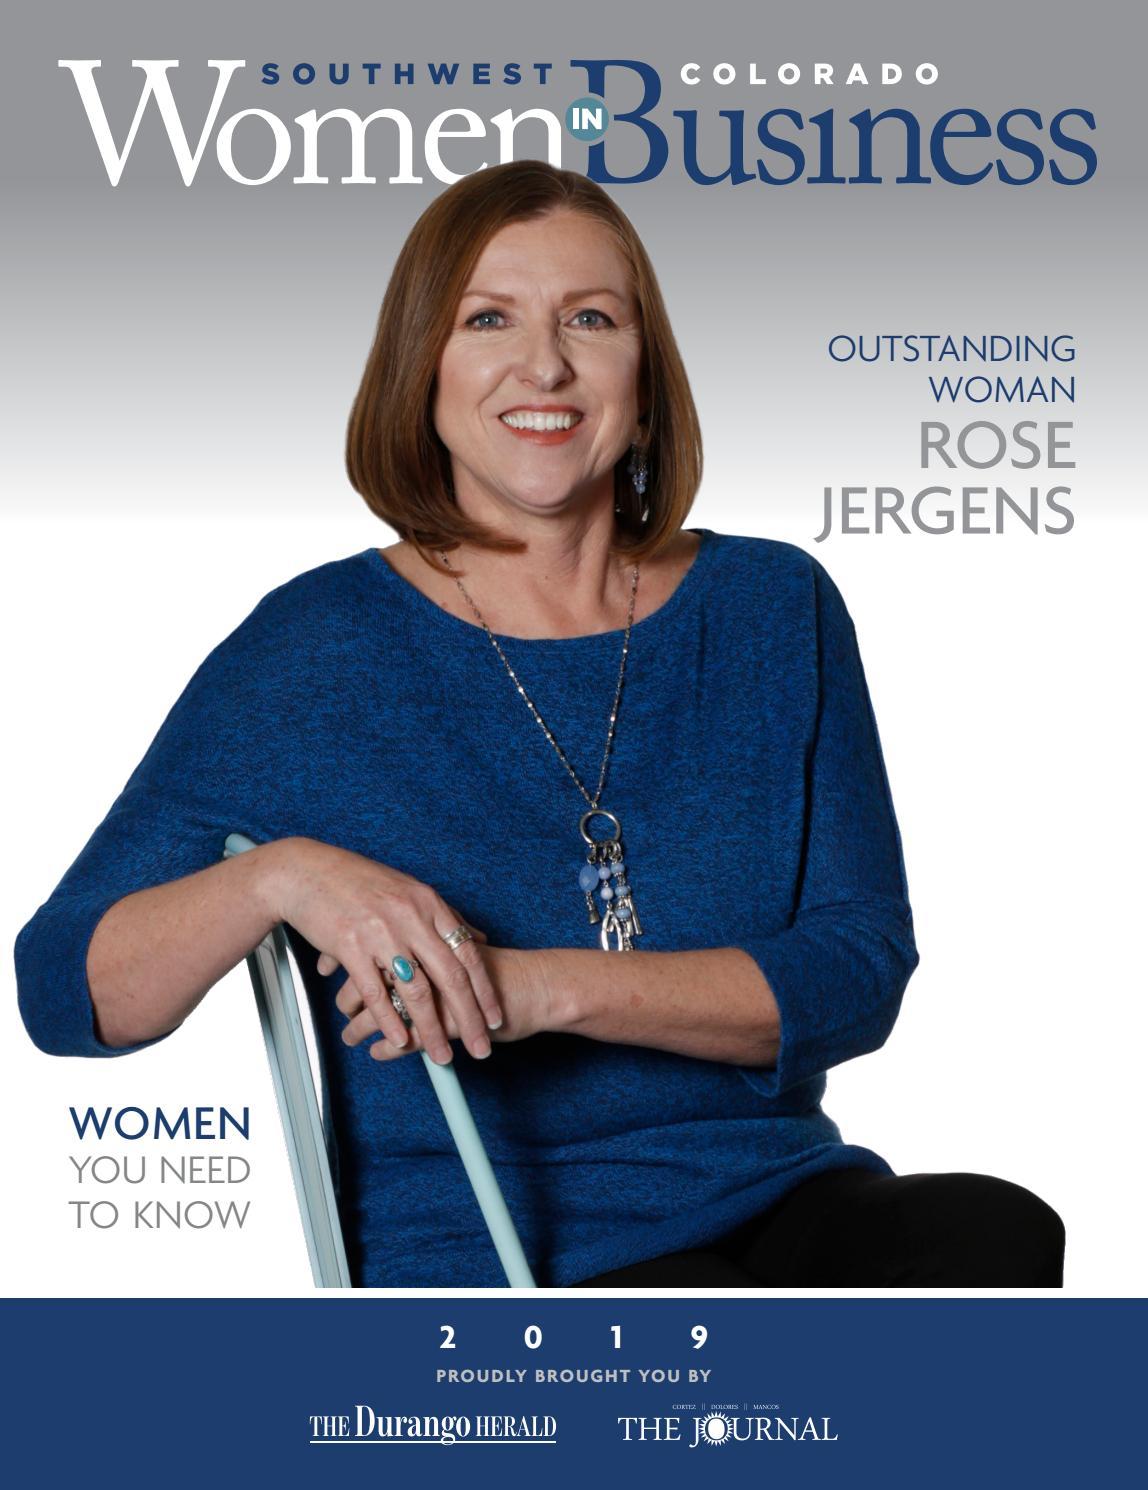 6963a0fd332f Southwest Colorado Women in Business by Ballantine Communications - issuu